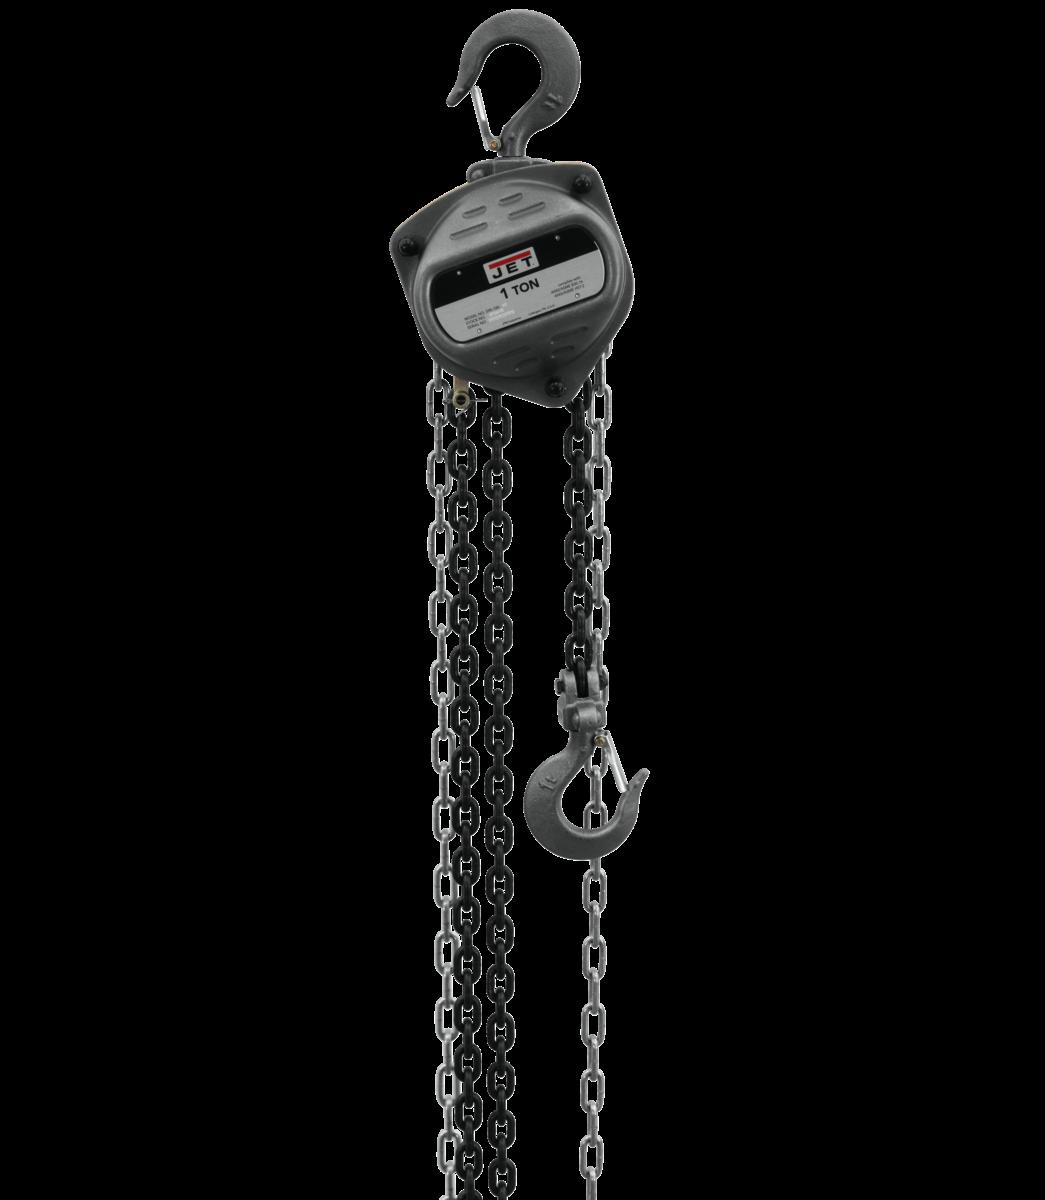 S90-100-10, 1-Ton Hand Chain Hoist With 10' Lift